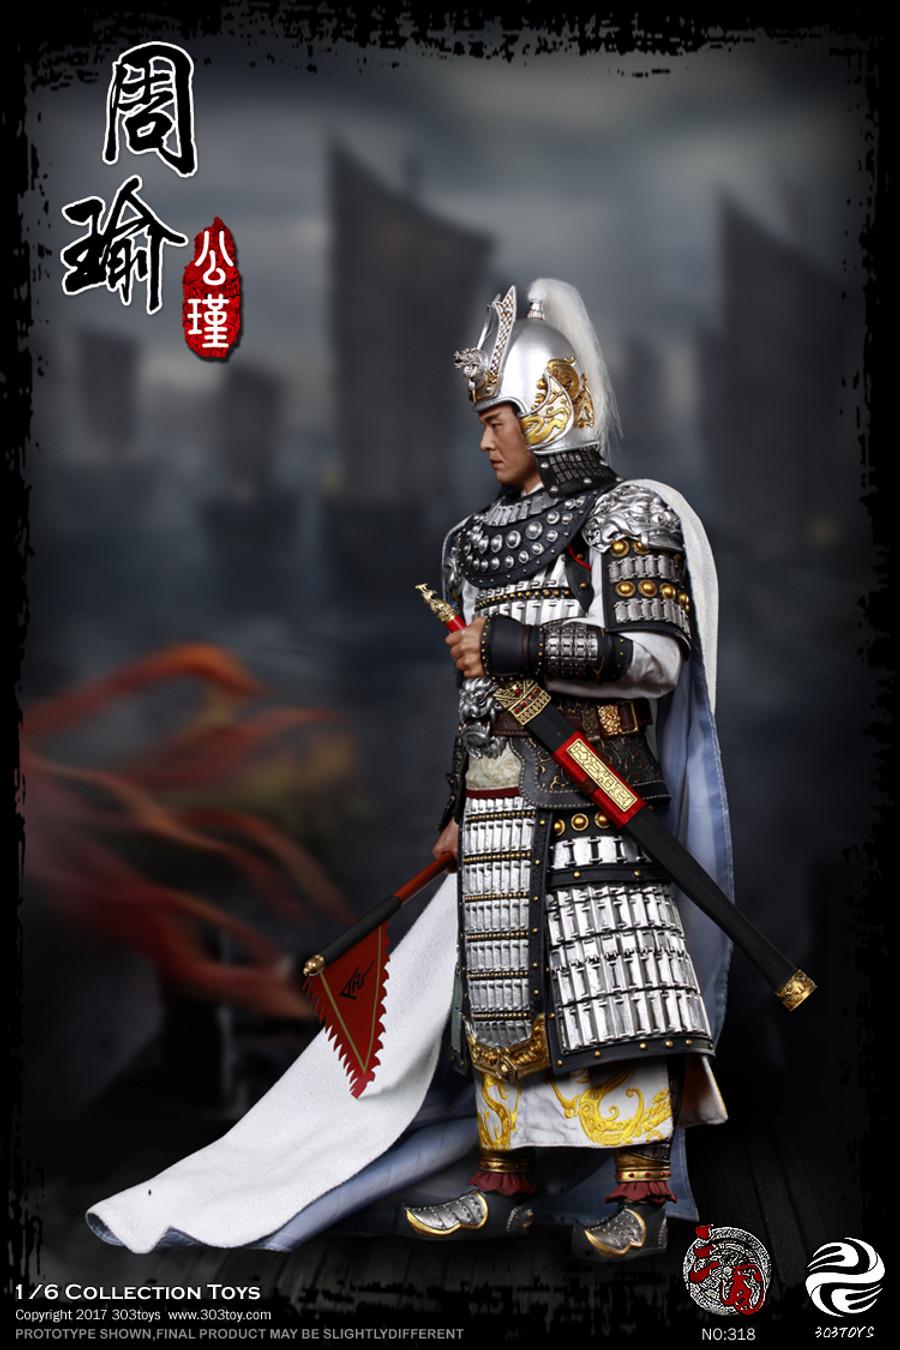 303 Toys - Zhou Yu A.K.A. Gongjin